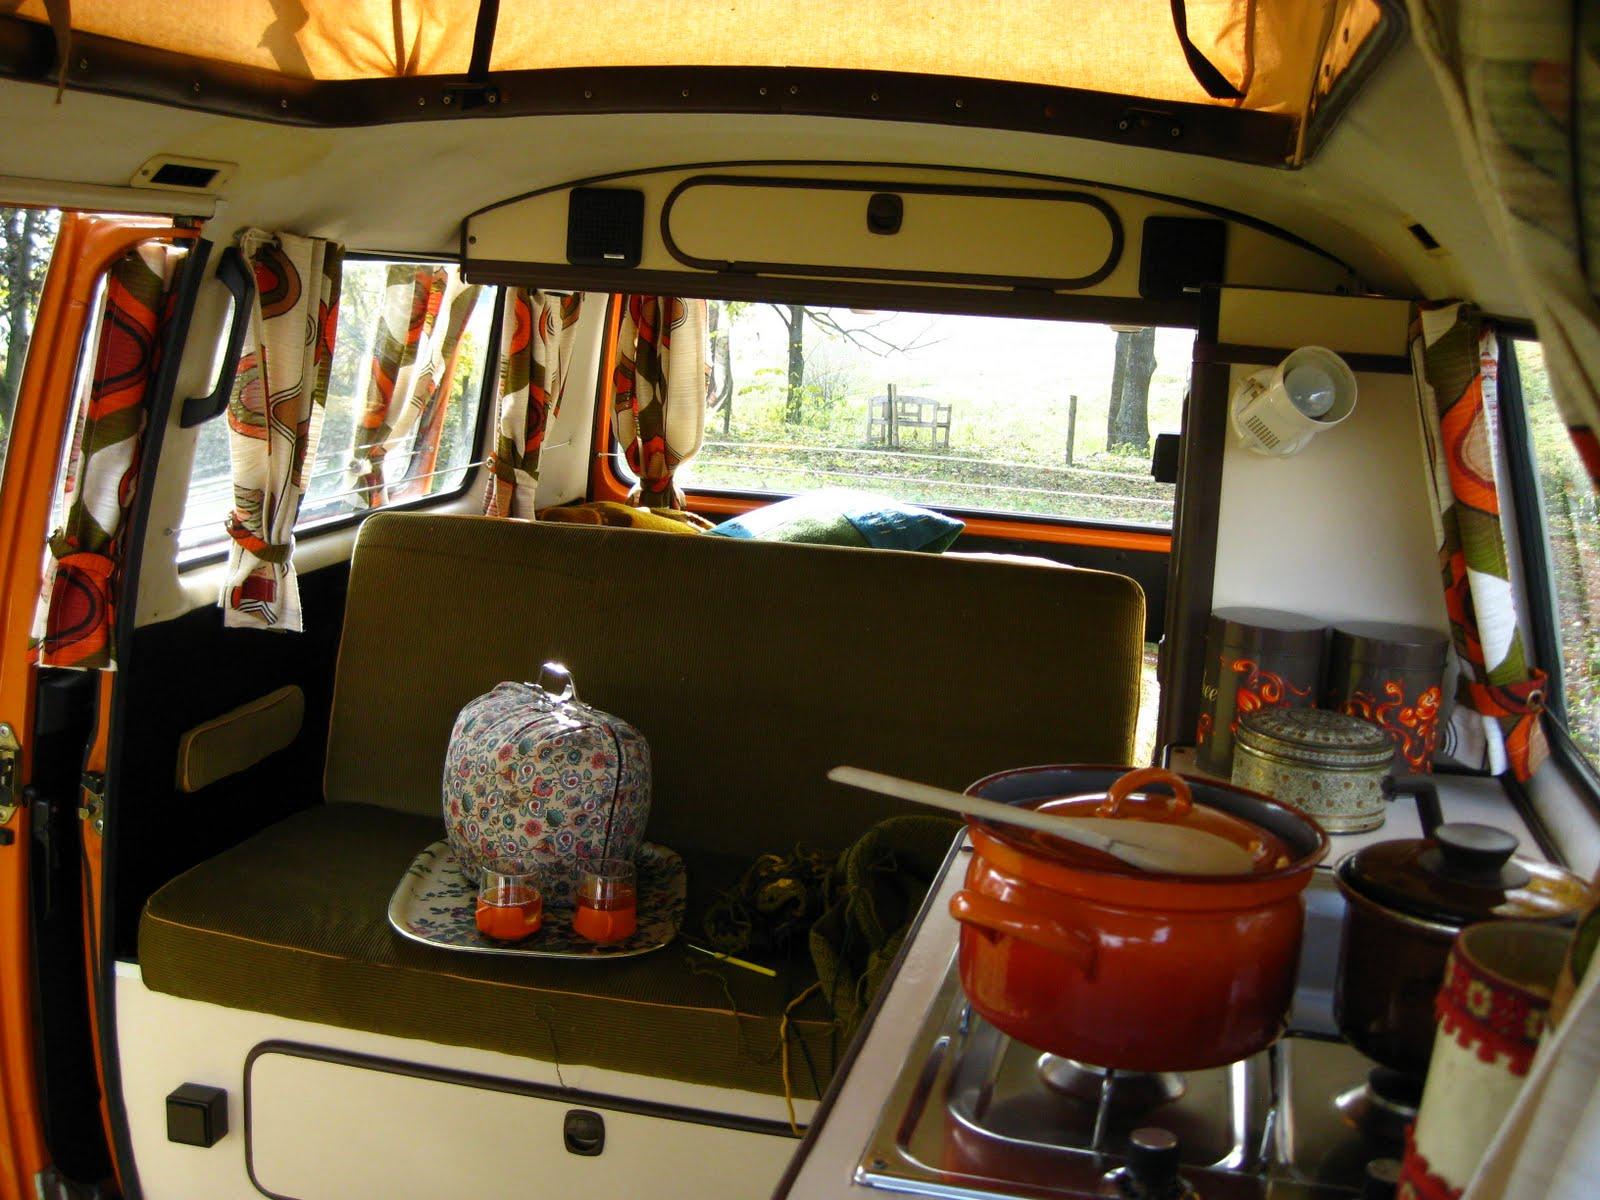 Gasthuis kaliste blog volkswagen t3 camper for Interieur westfalia t3